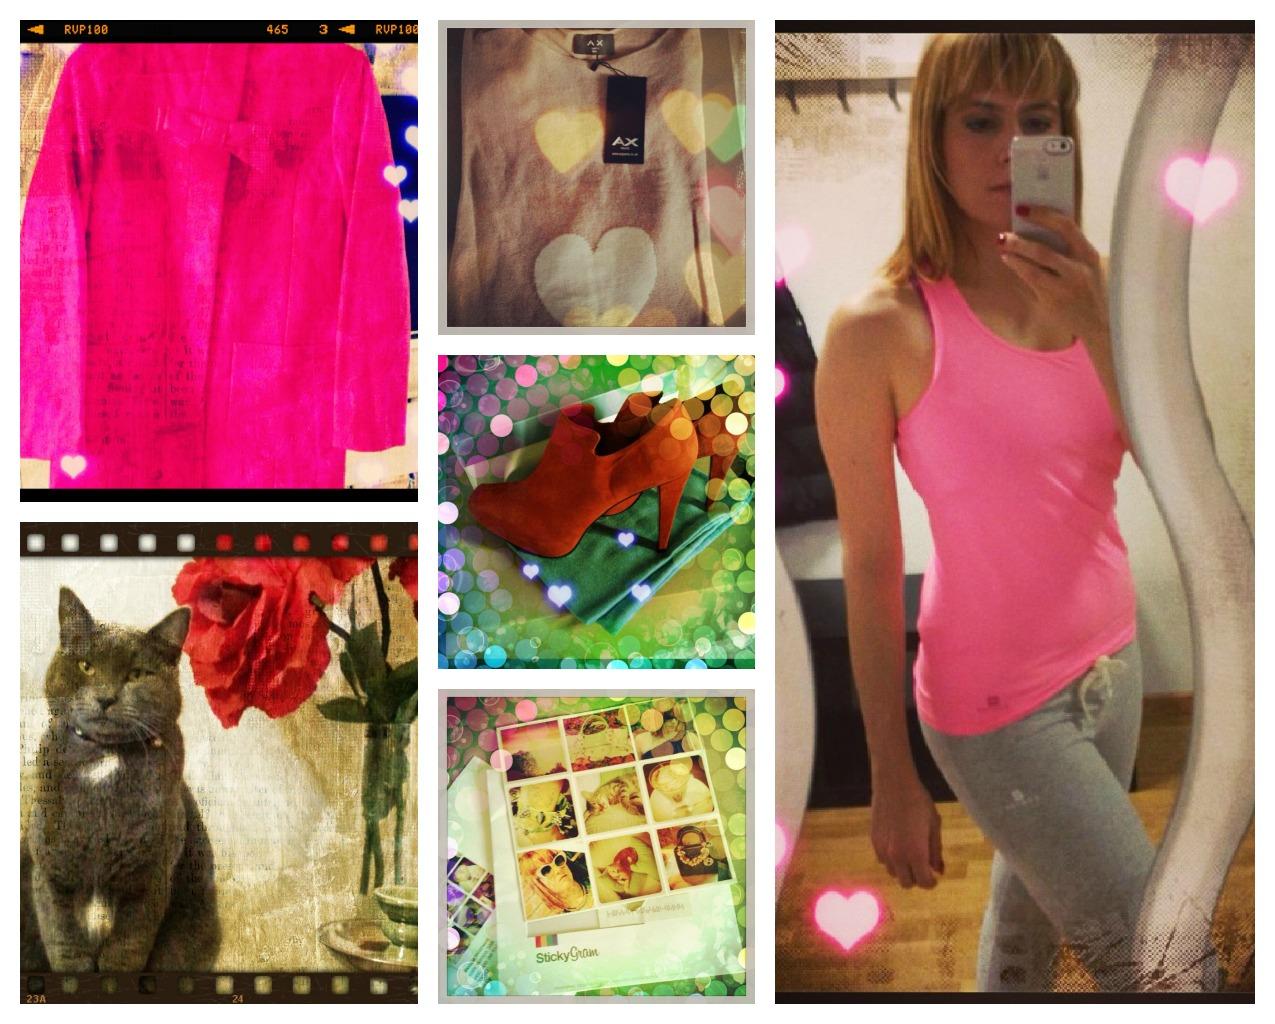 alessia milanese, thechilicool, fashion blog, fashion blogger,INSTA LIFE 39 + insta video 2